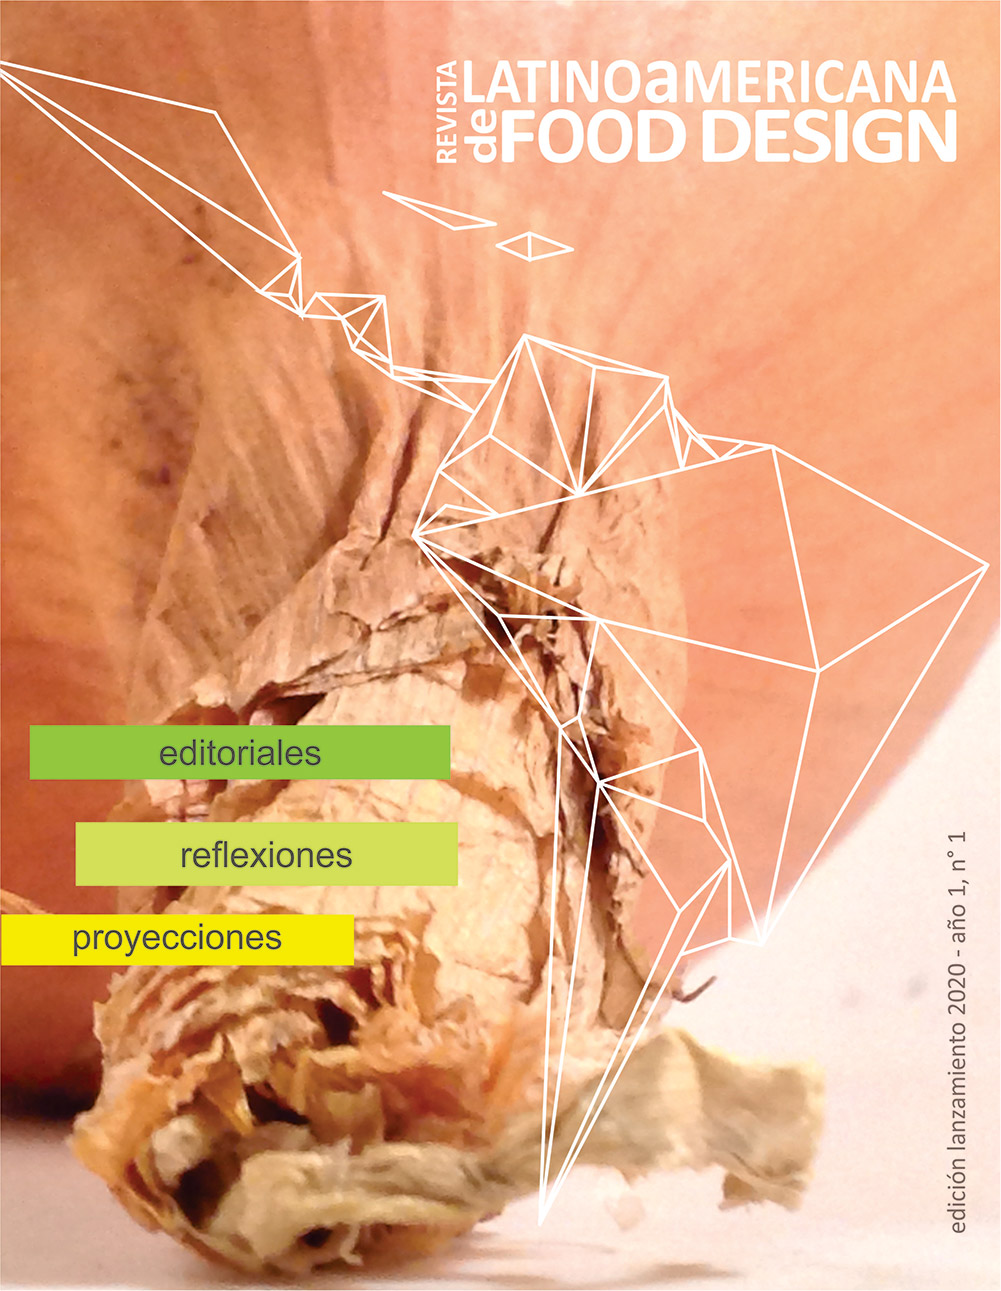 Revista Latinoamericana de Food Design